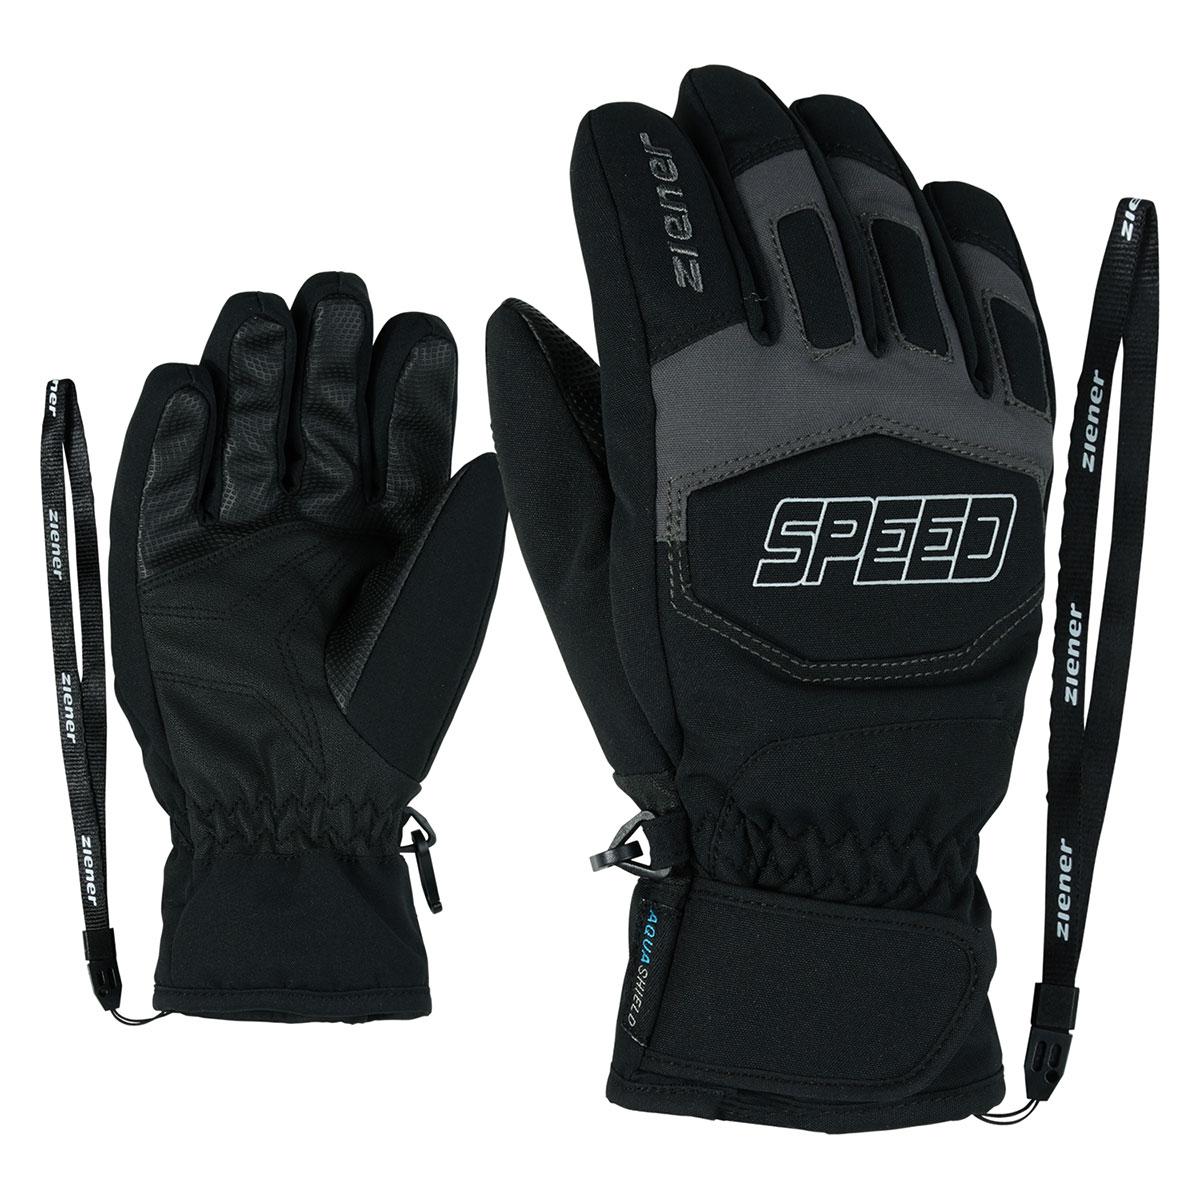 Ziener Leedim AsR Glove Junior 2021